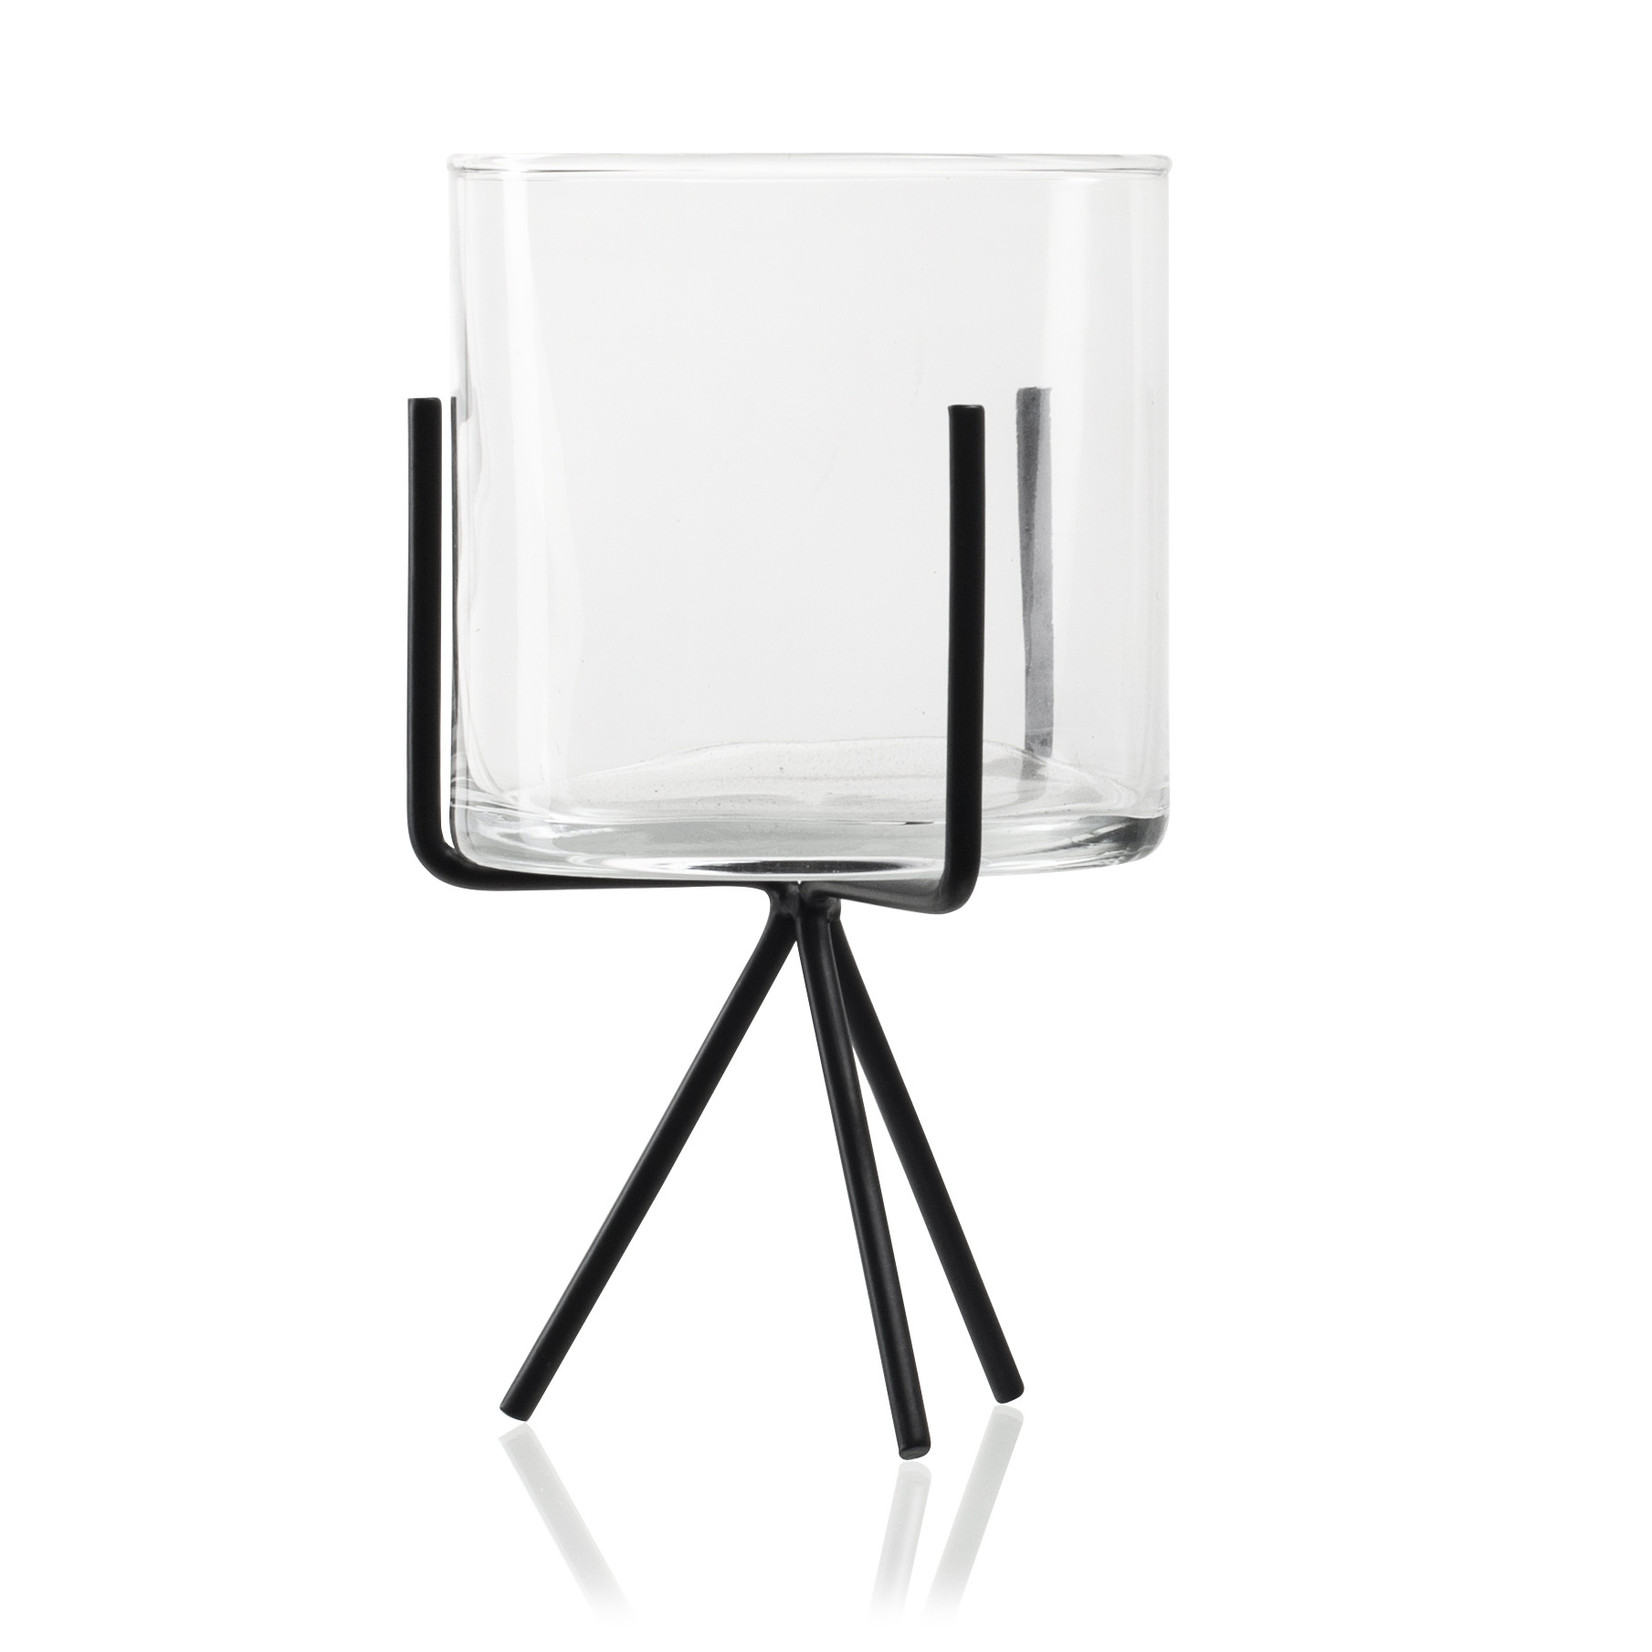 Jodeco Glass Metalen standaard met glas 'Melle' H22 D12 cm Transparant